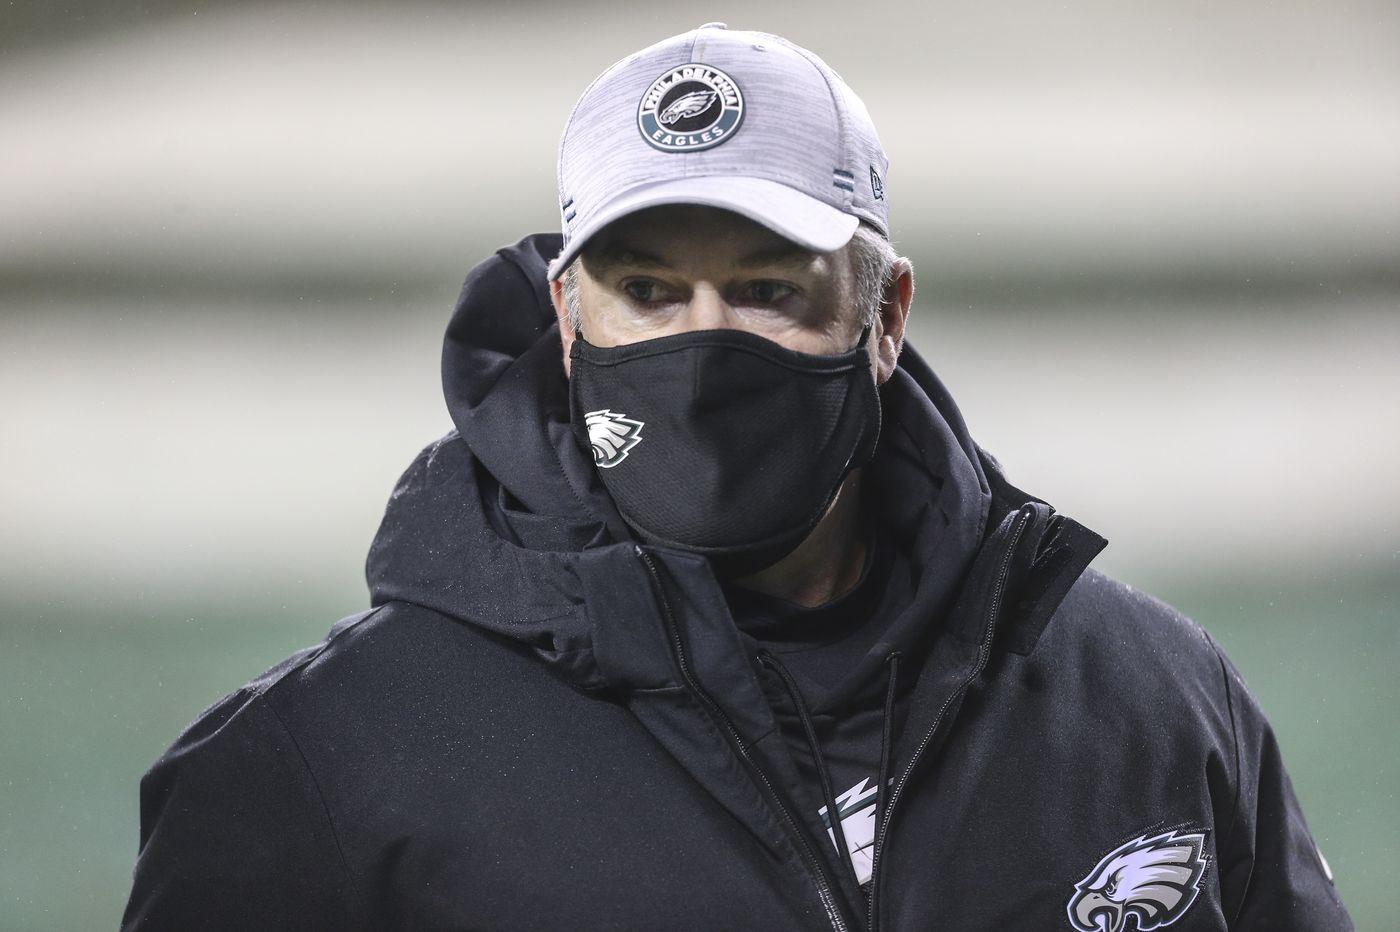 Eagles brass sends clear message in fitting end to dreadful season | Jeff McLane